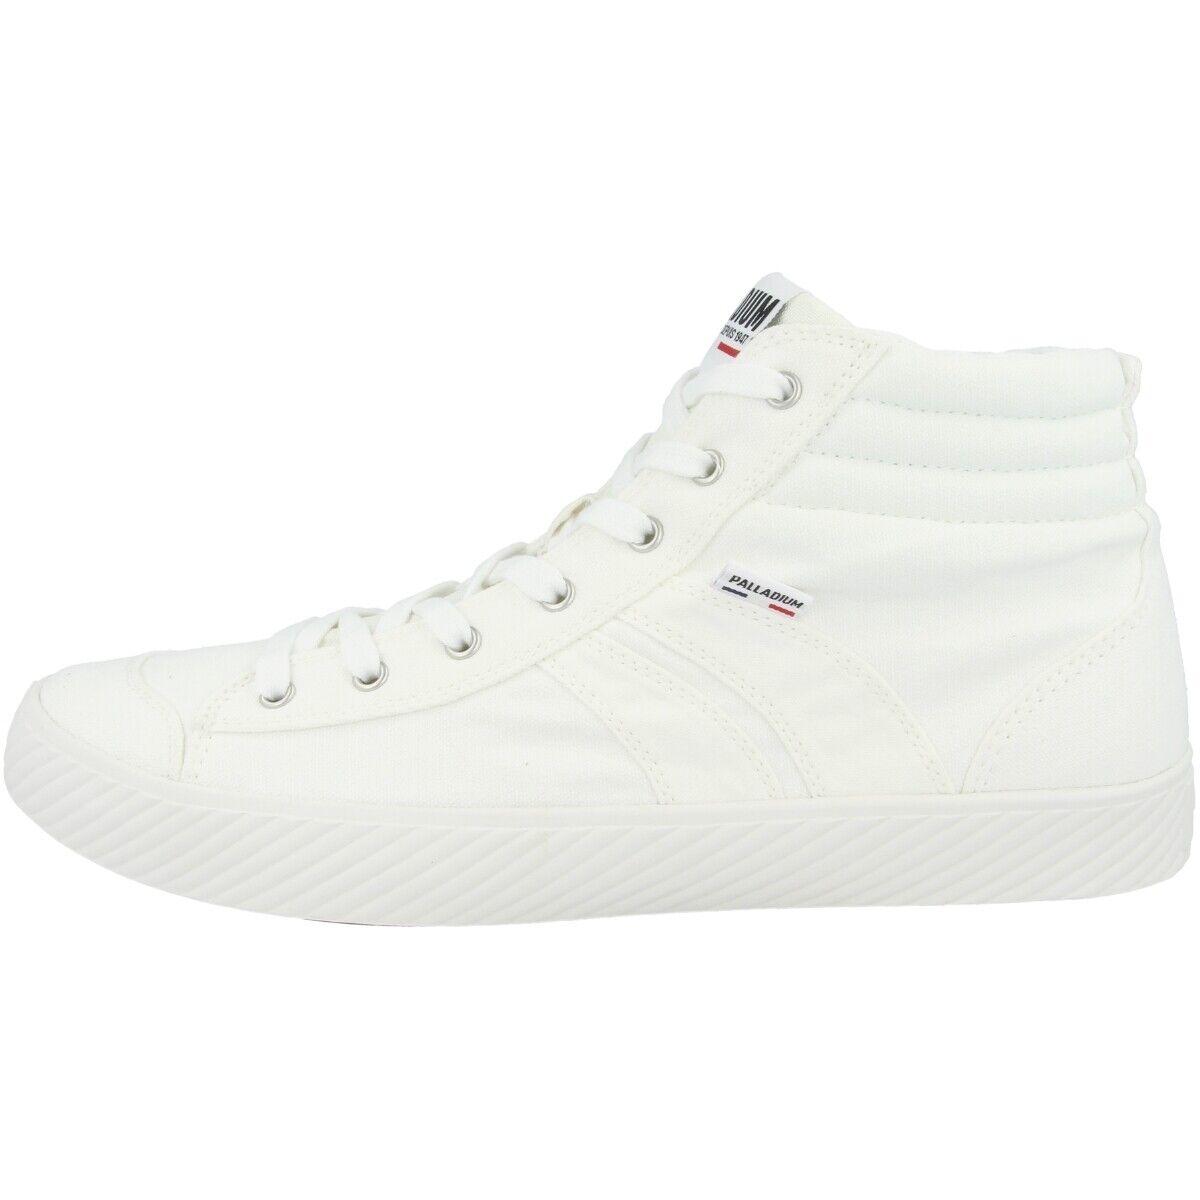 Palladium pallaphoenix Cuff Canvas Boots shoes High Top Sneaker White 76190-116